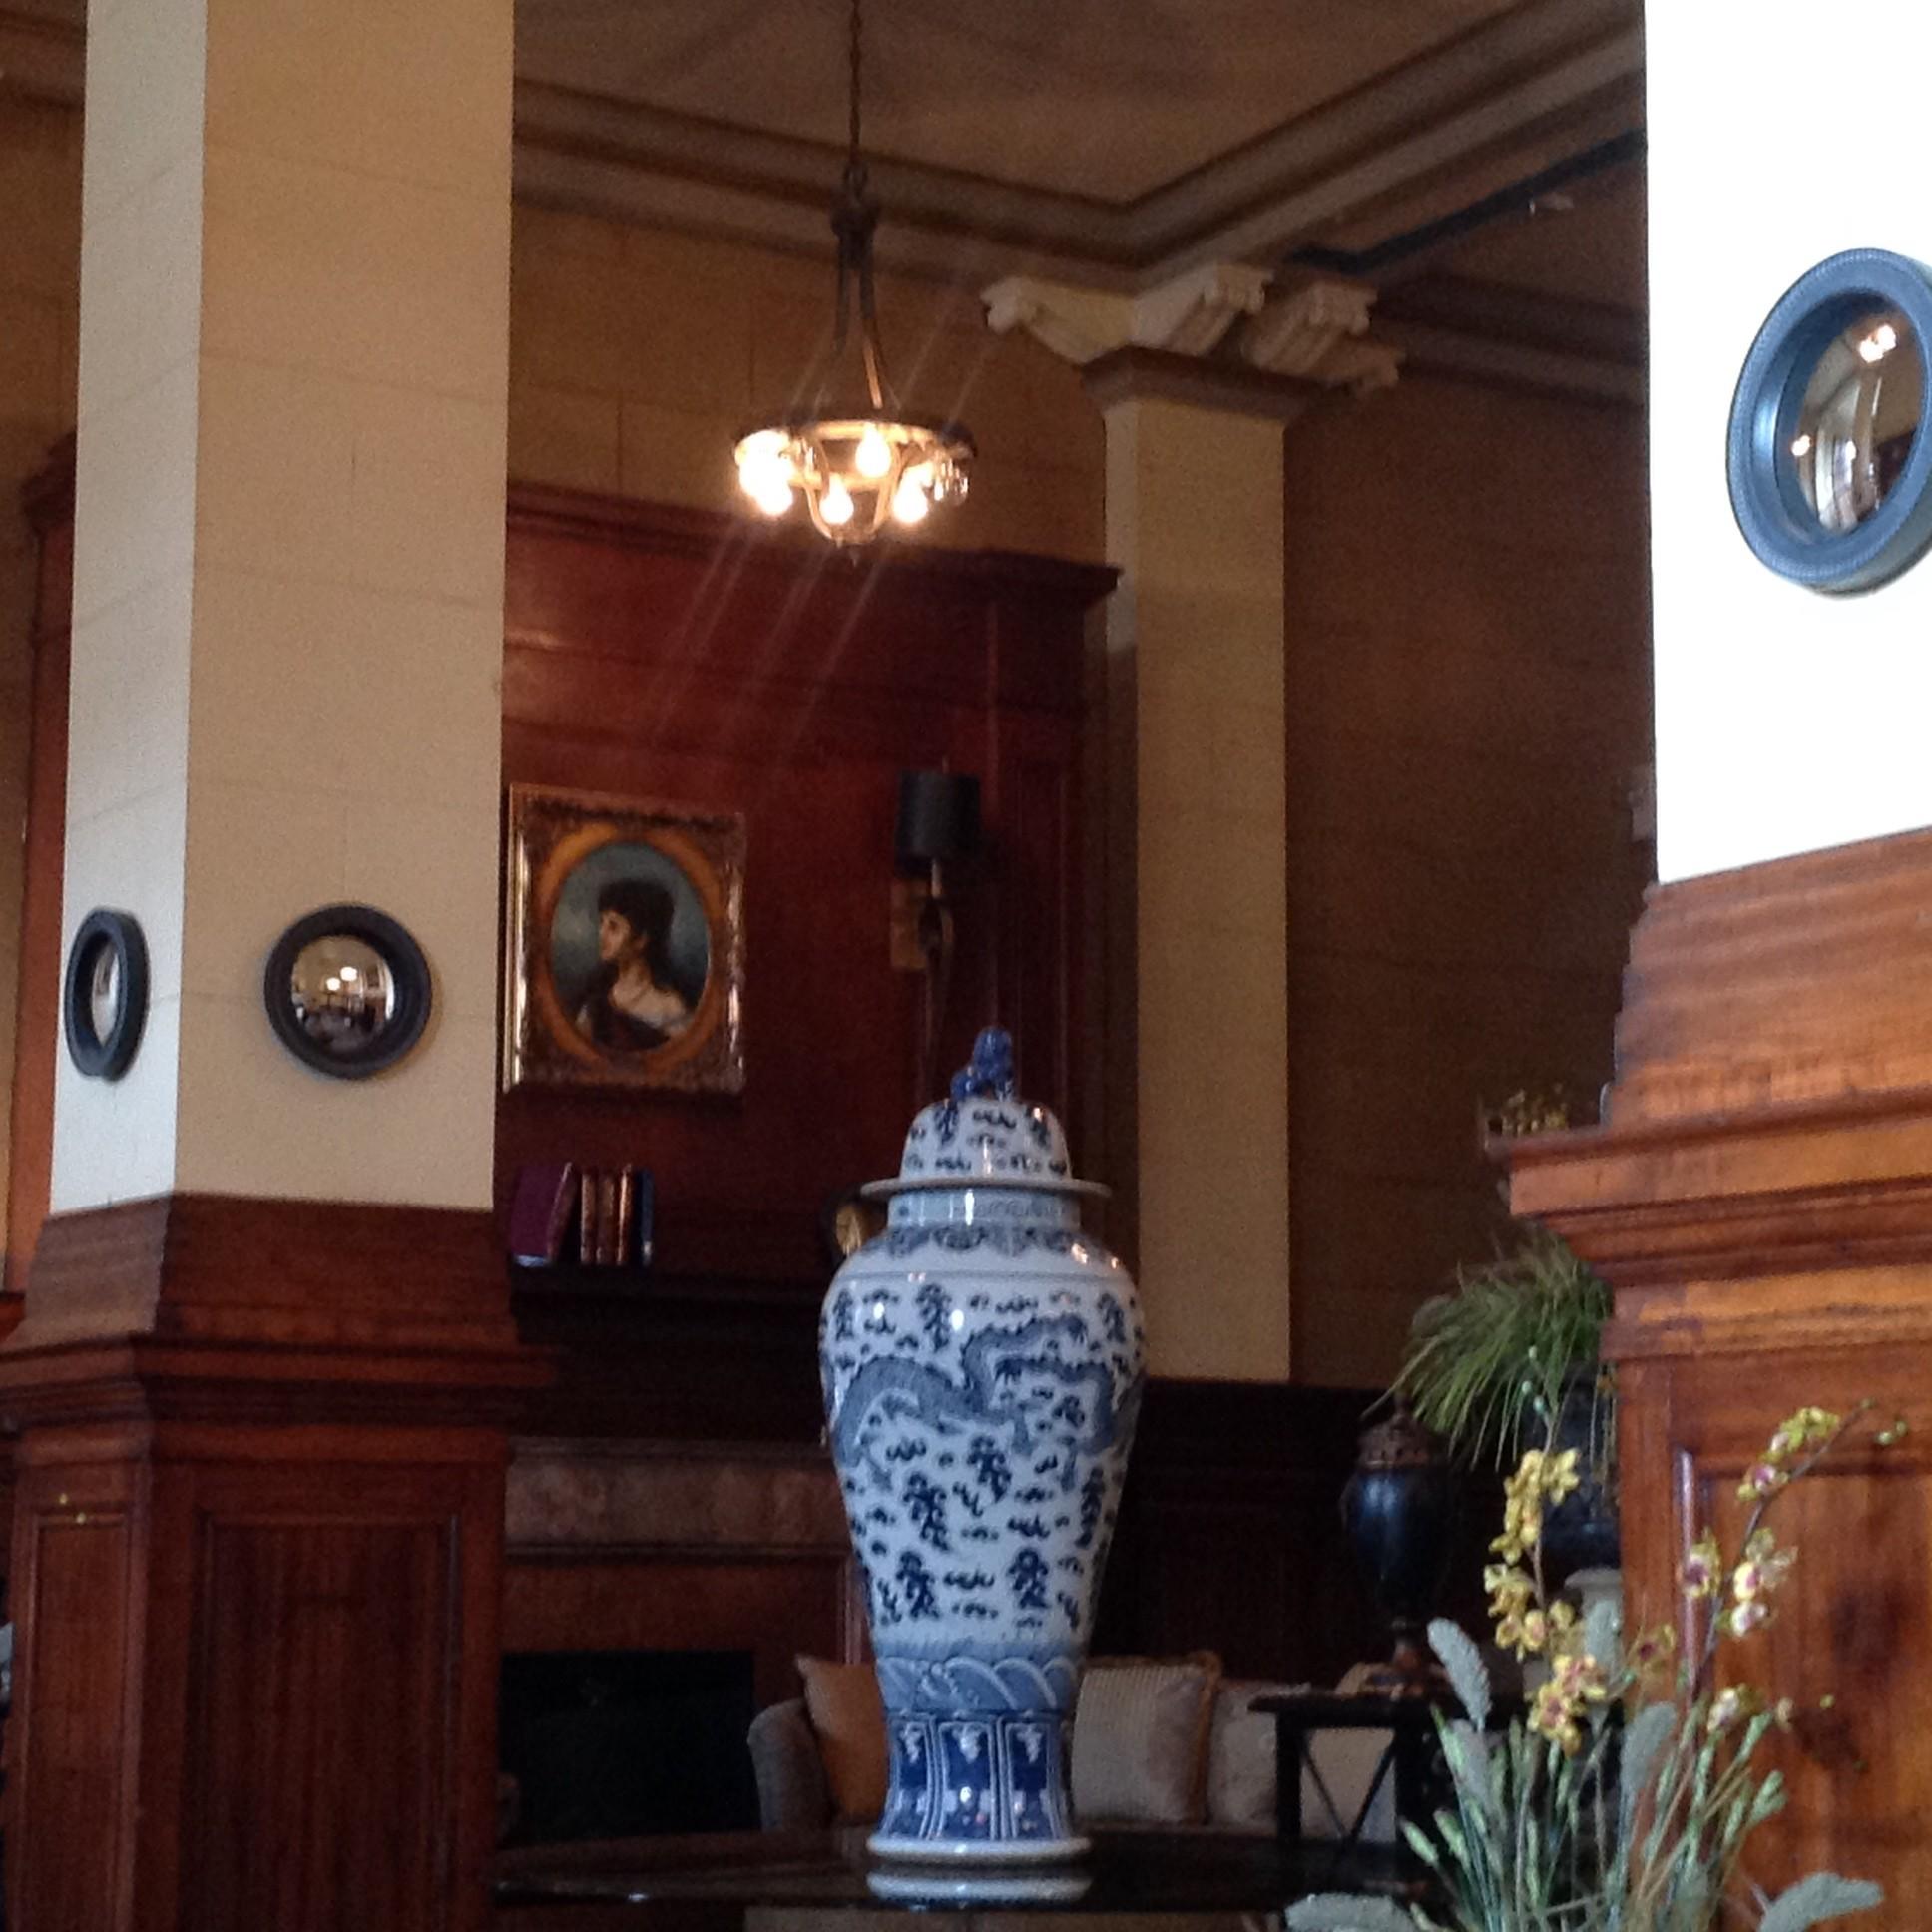 The Calhoun Historic Lofts